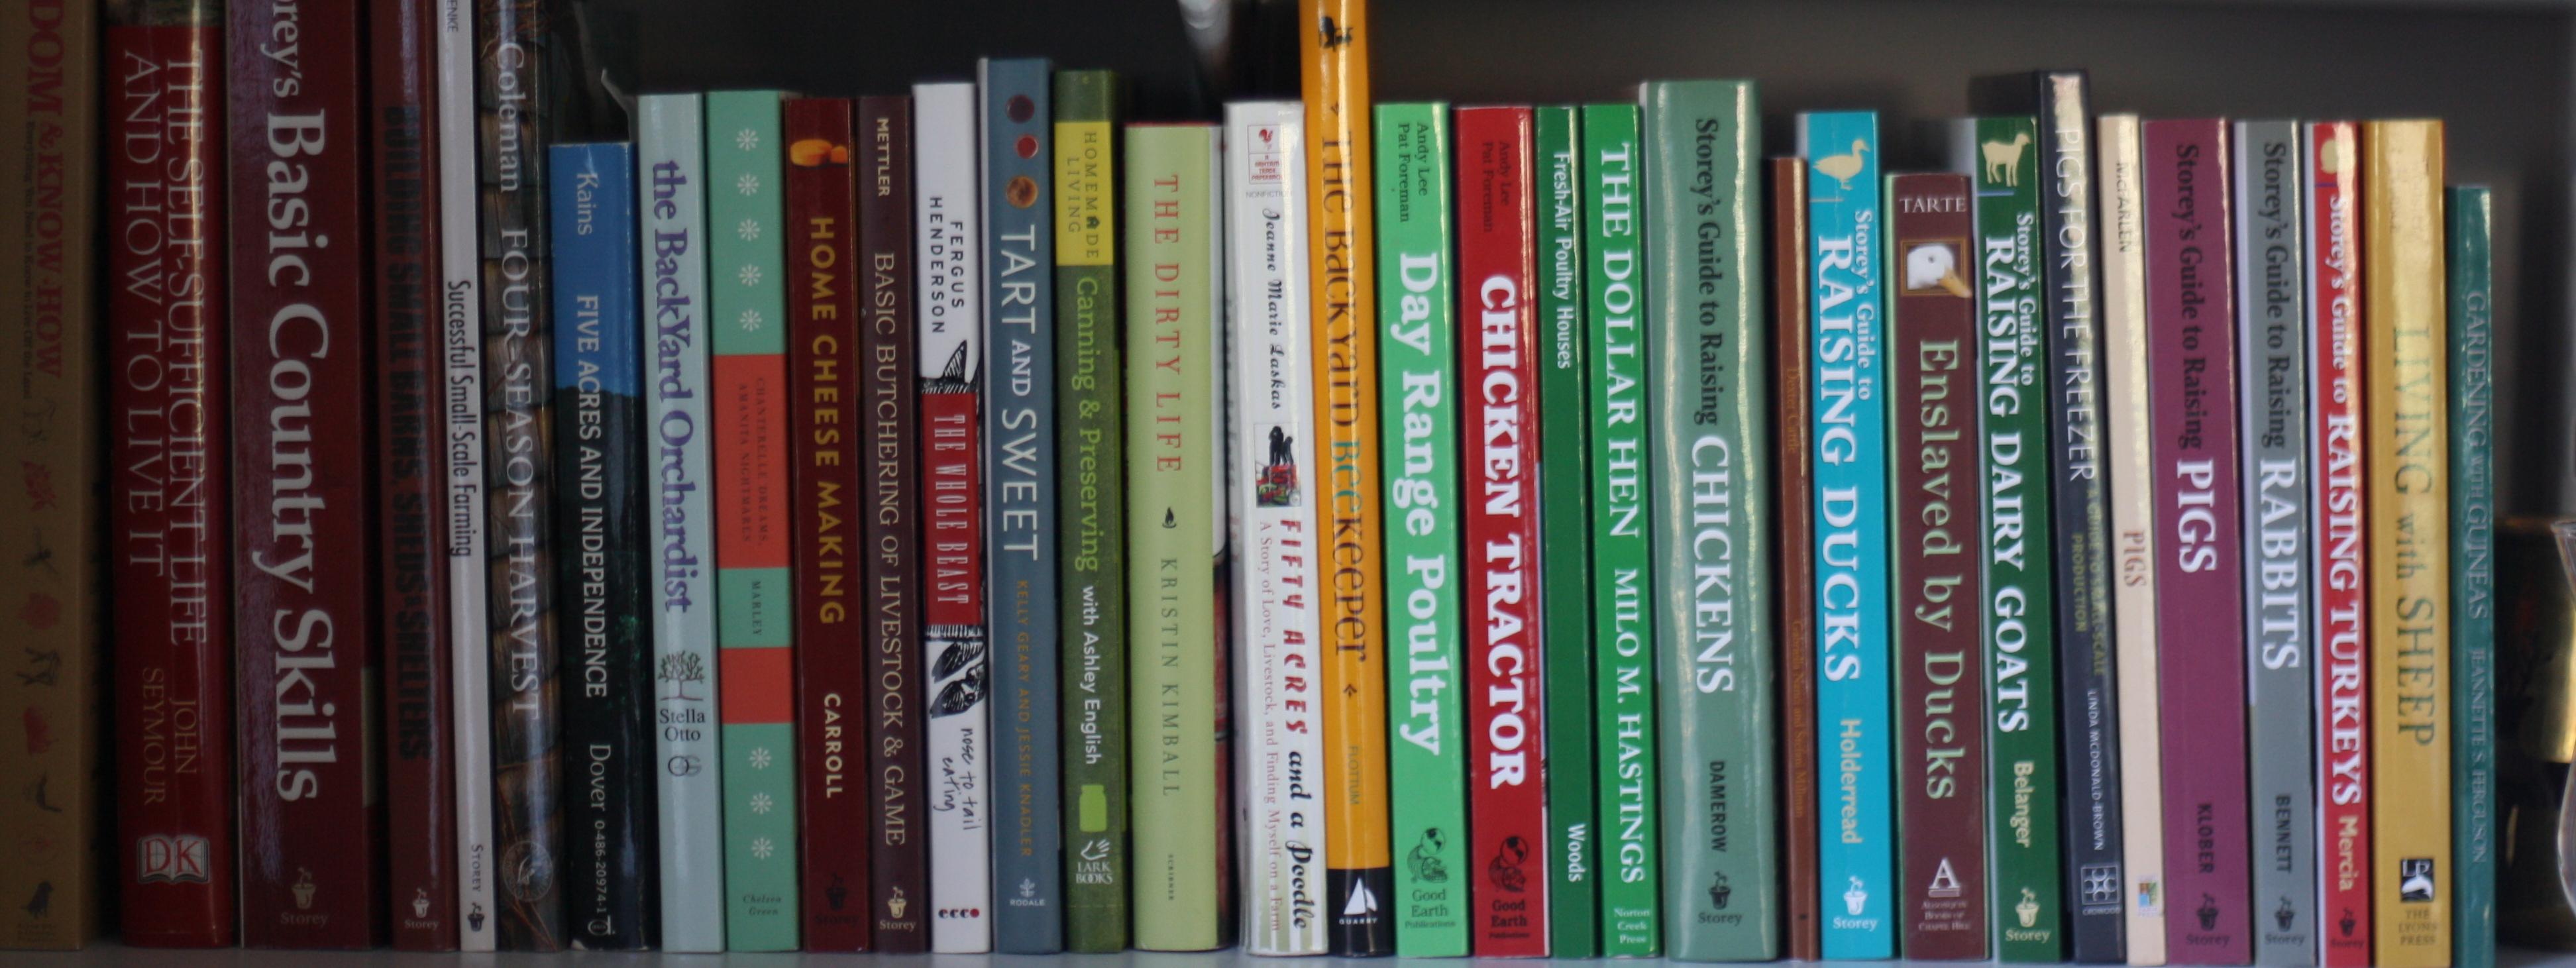 Row of books photo